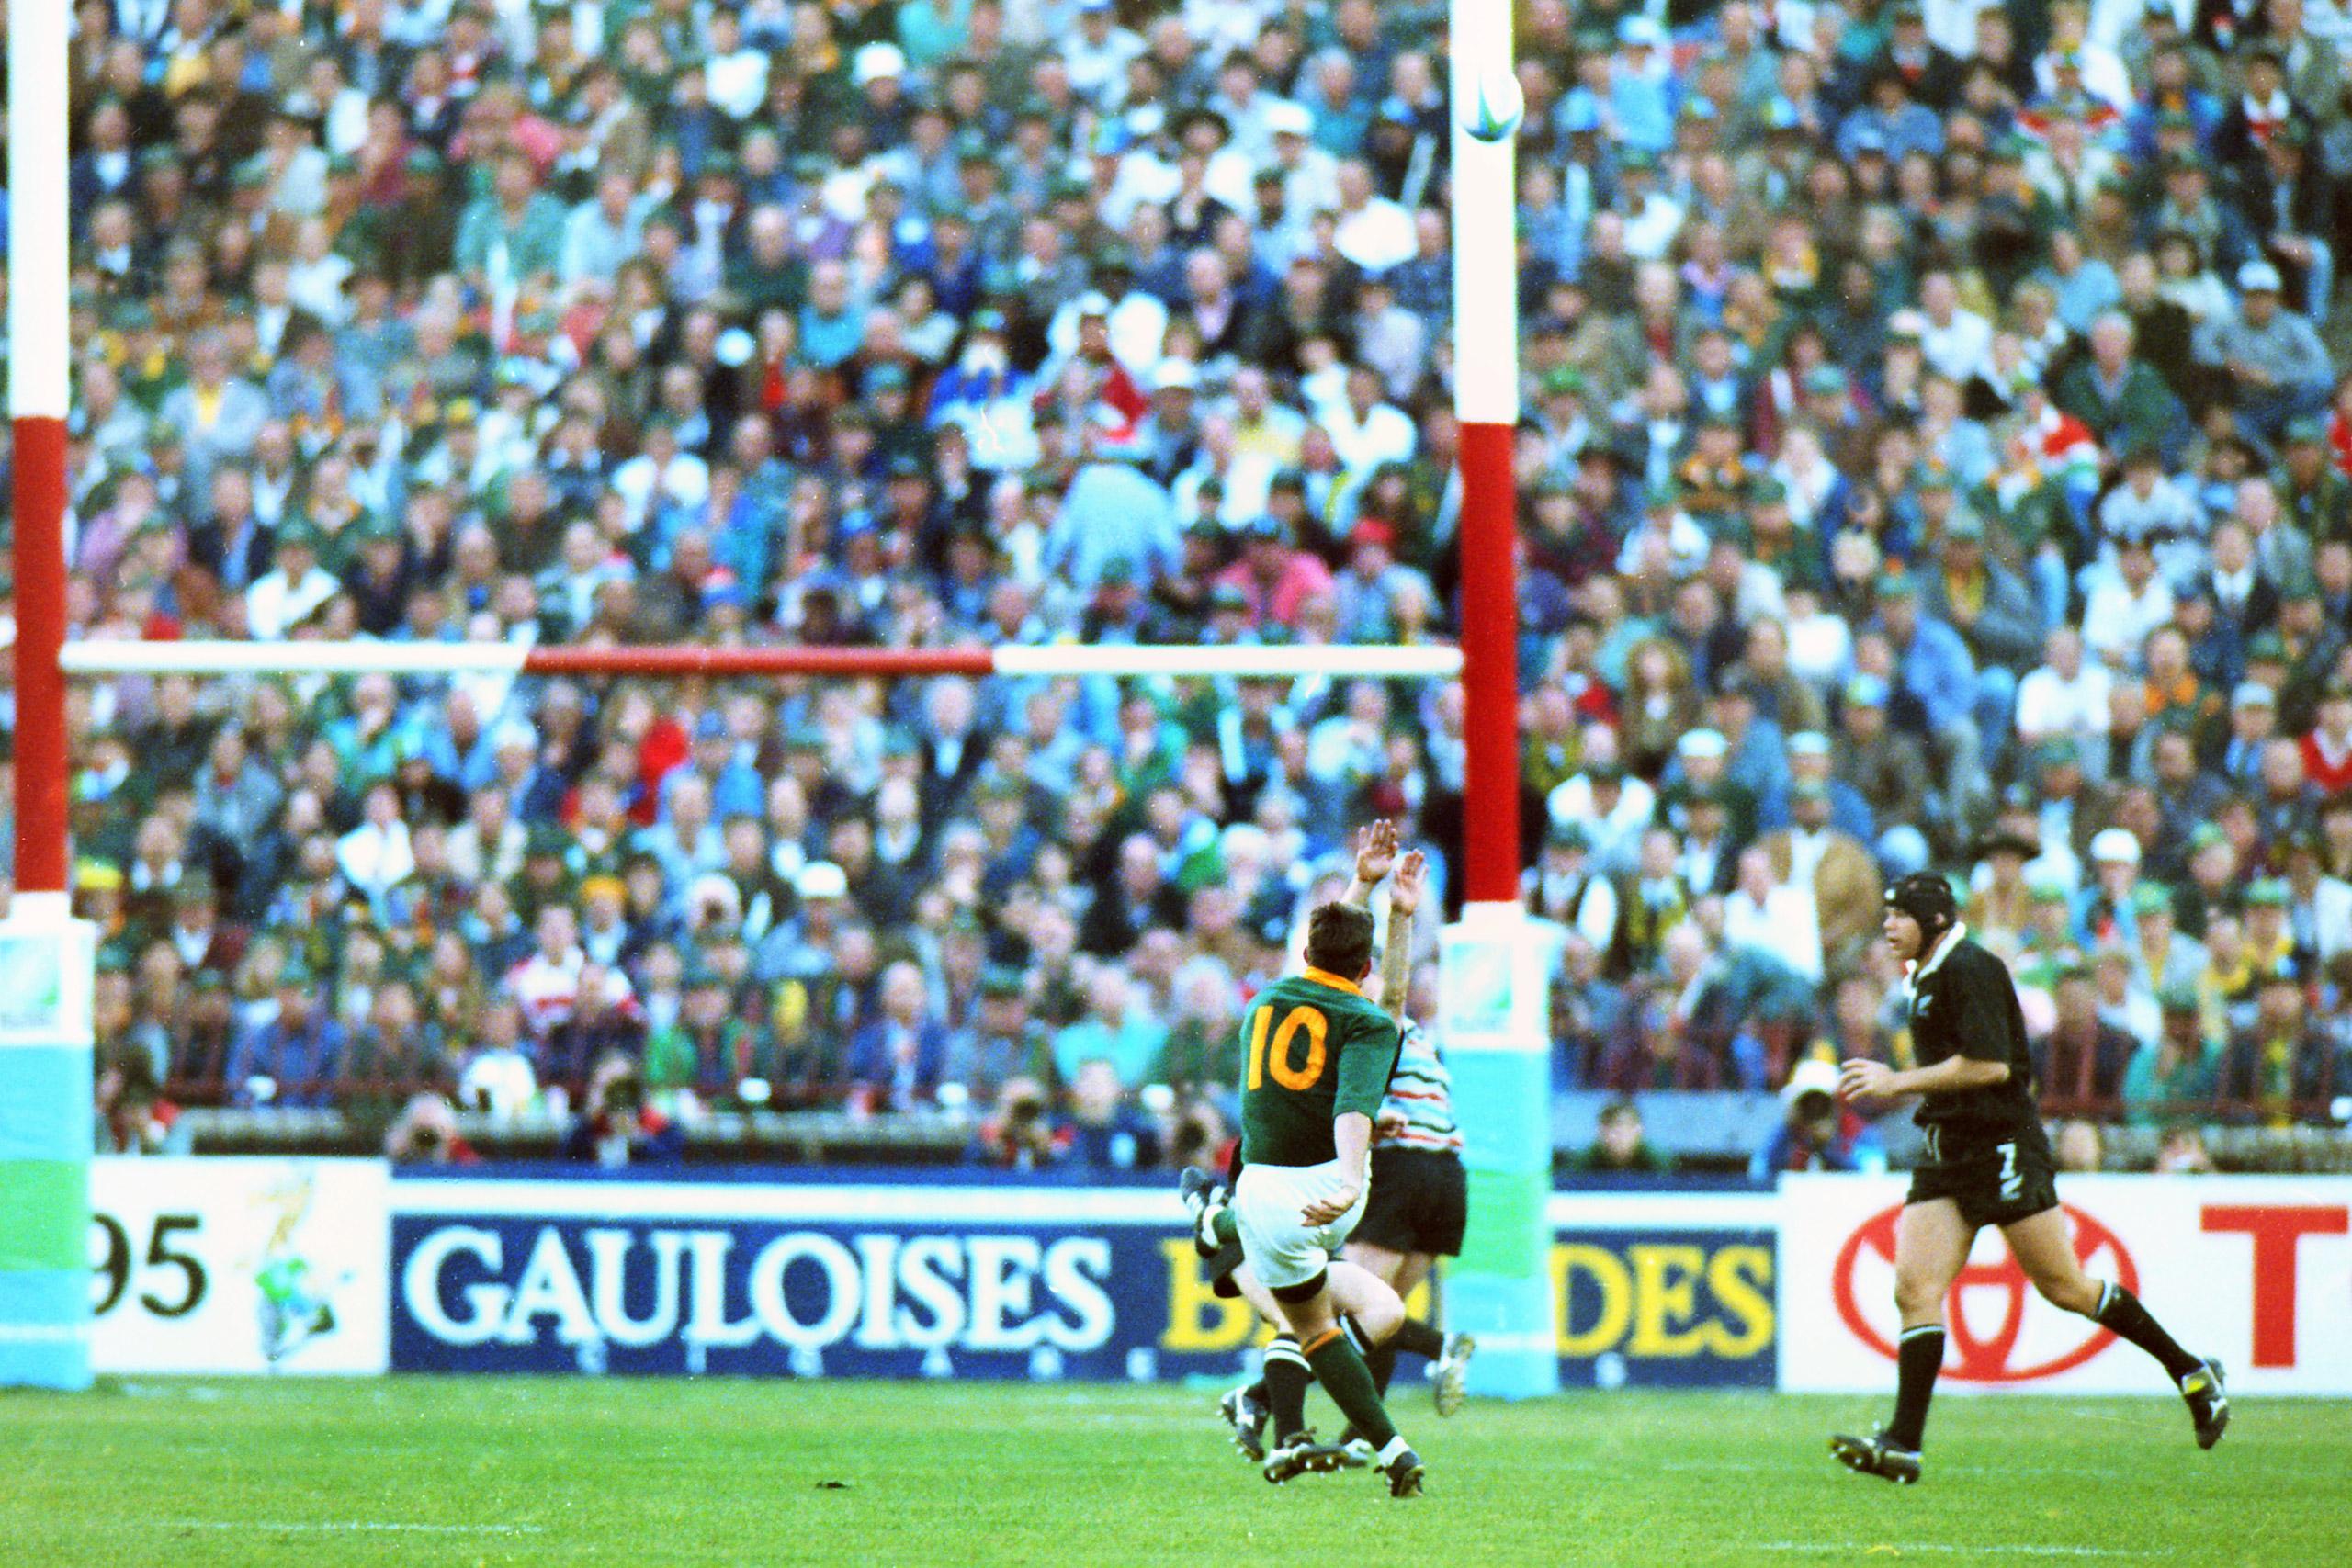 Joel Stransky kicks the winning drop-goal for South Africa at Ellis Park, Johannesburg.